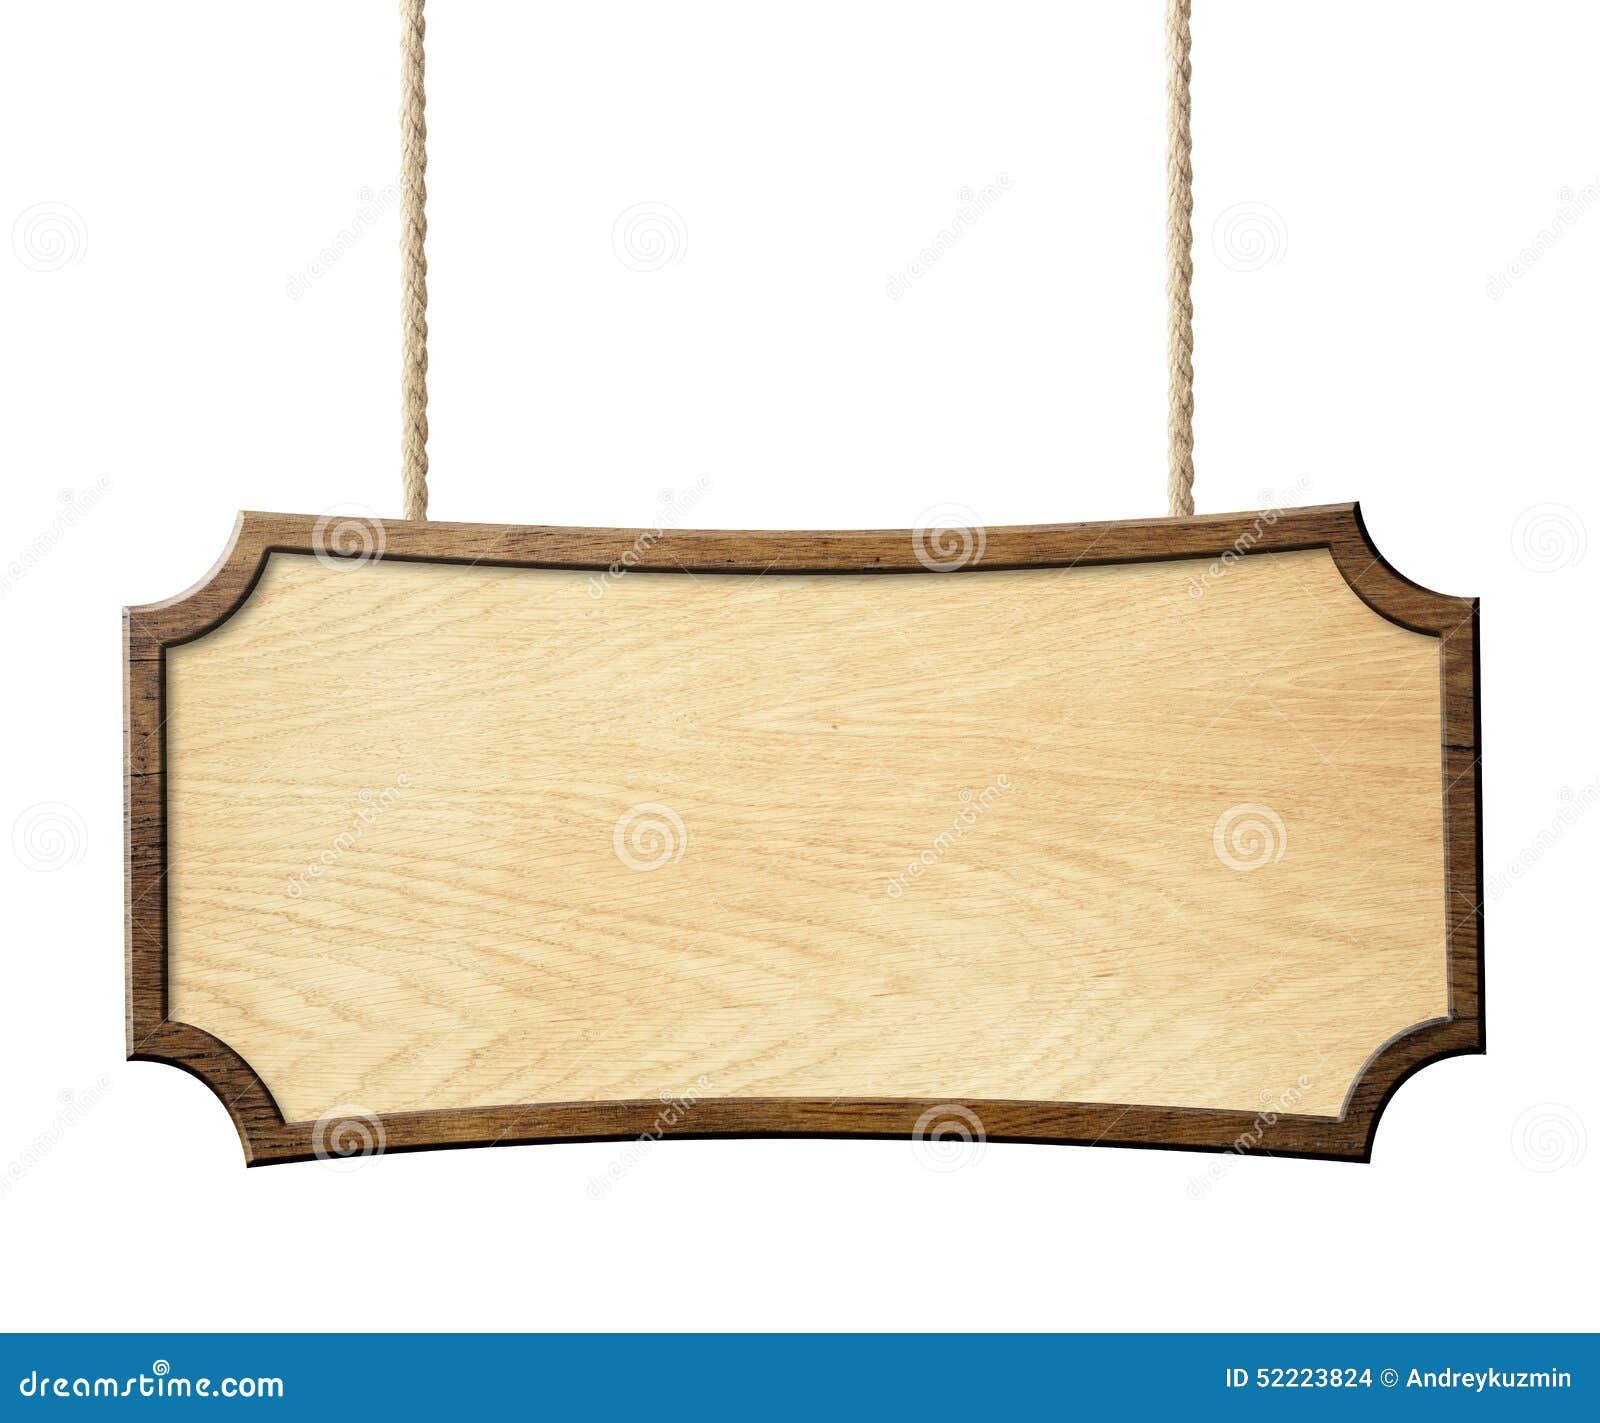 Wood Sign Hanging On Ropes Isolated On White Stock Photo